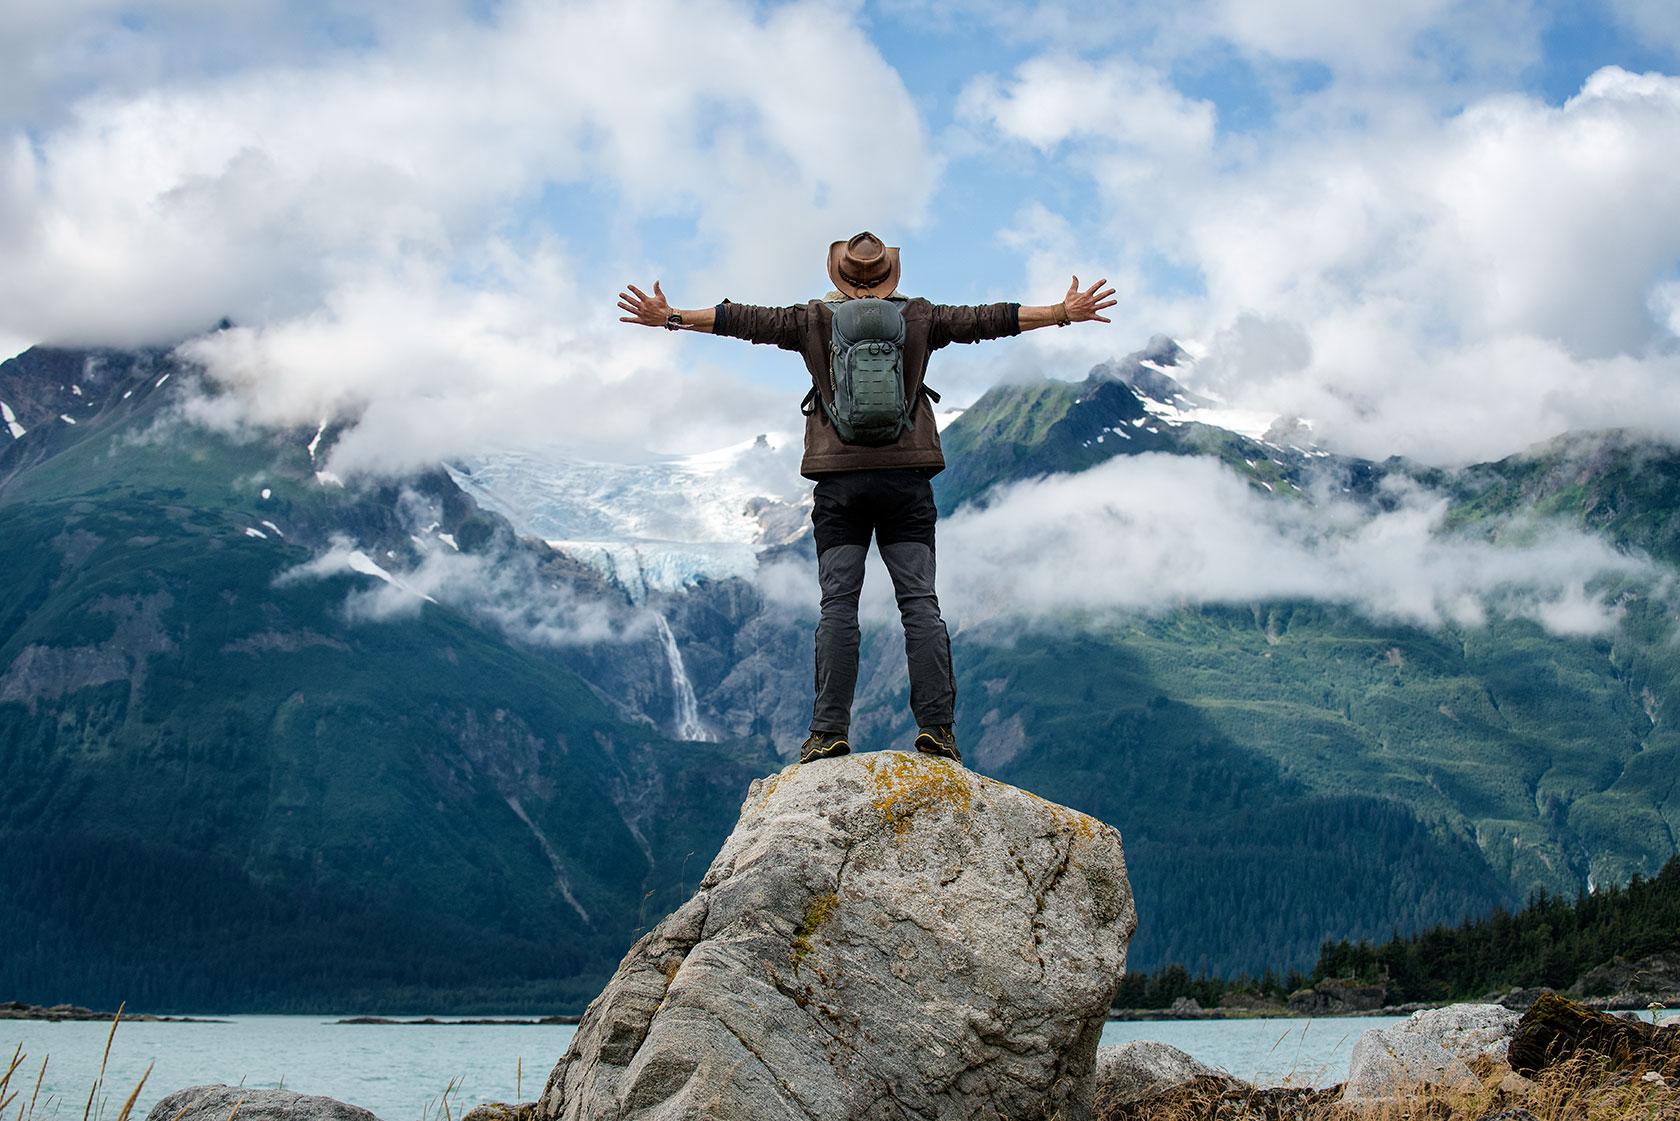 austin-trigg-brave-wilderness-alaska-BW-Coyote-Wings-Spread-Chilkat-Park.jpg